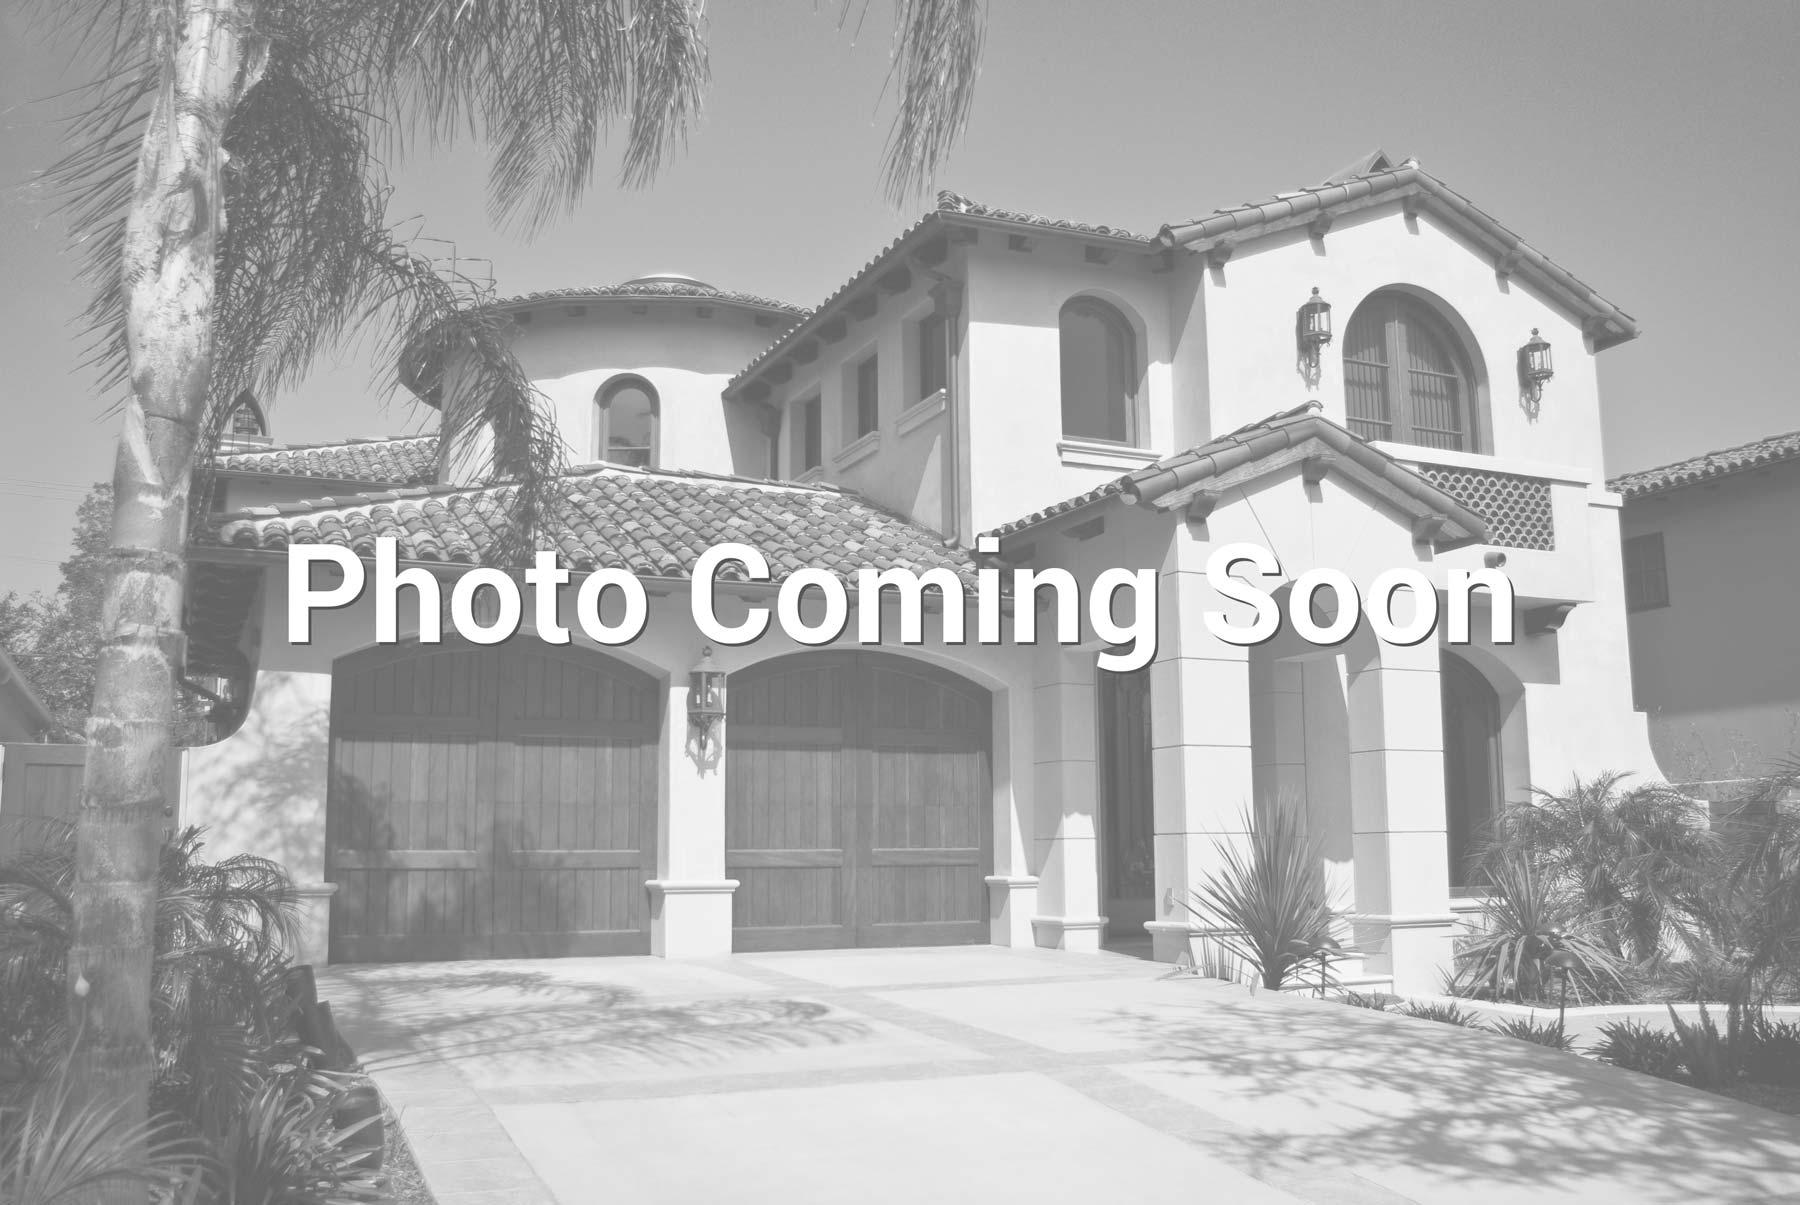 $274,900 - 2Br/2Ba -  for Sale in Venu At Grayhawk Condominium, Scottsdale